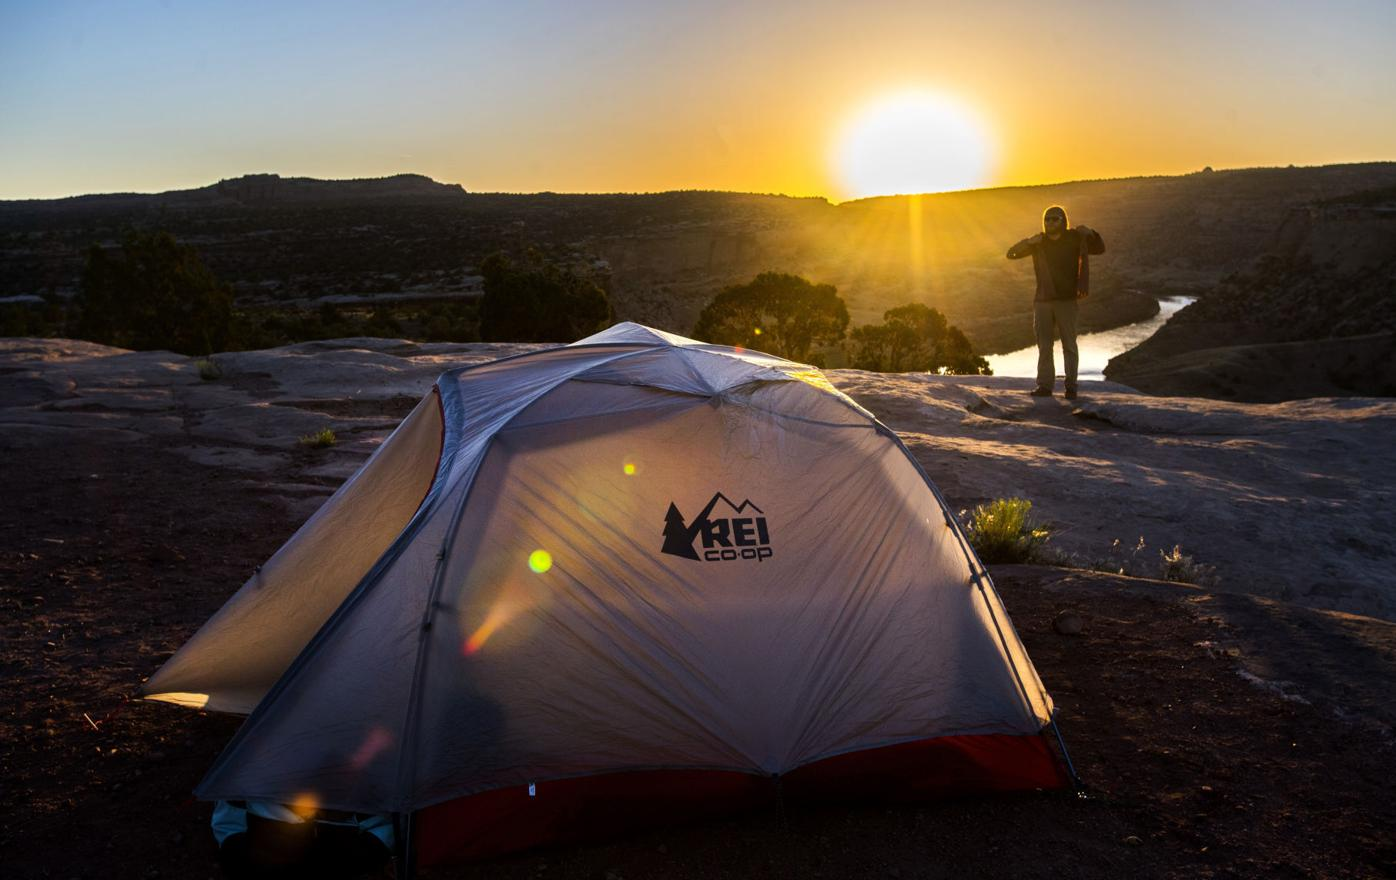 052421-ot-camping 1.jpg